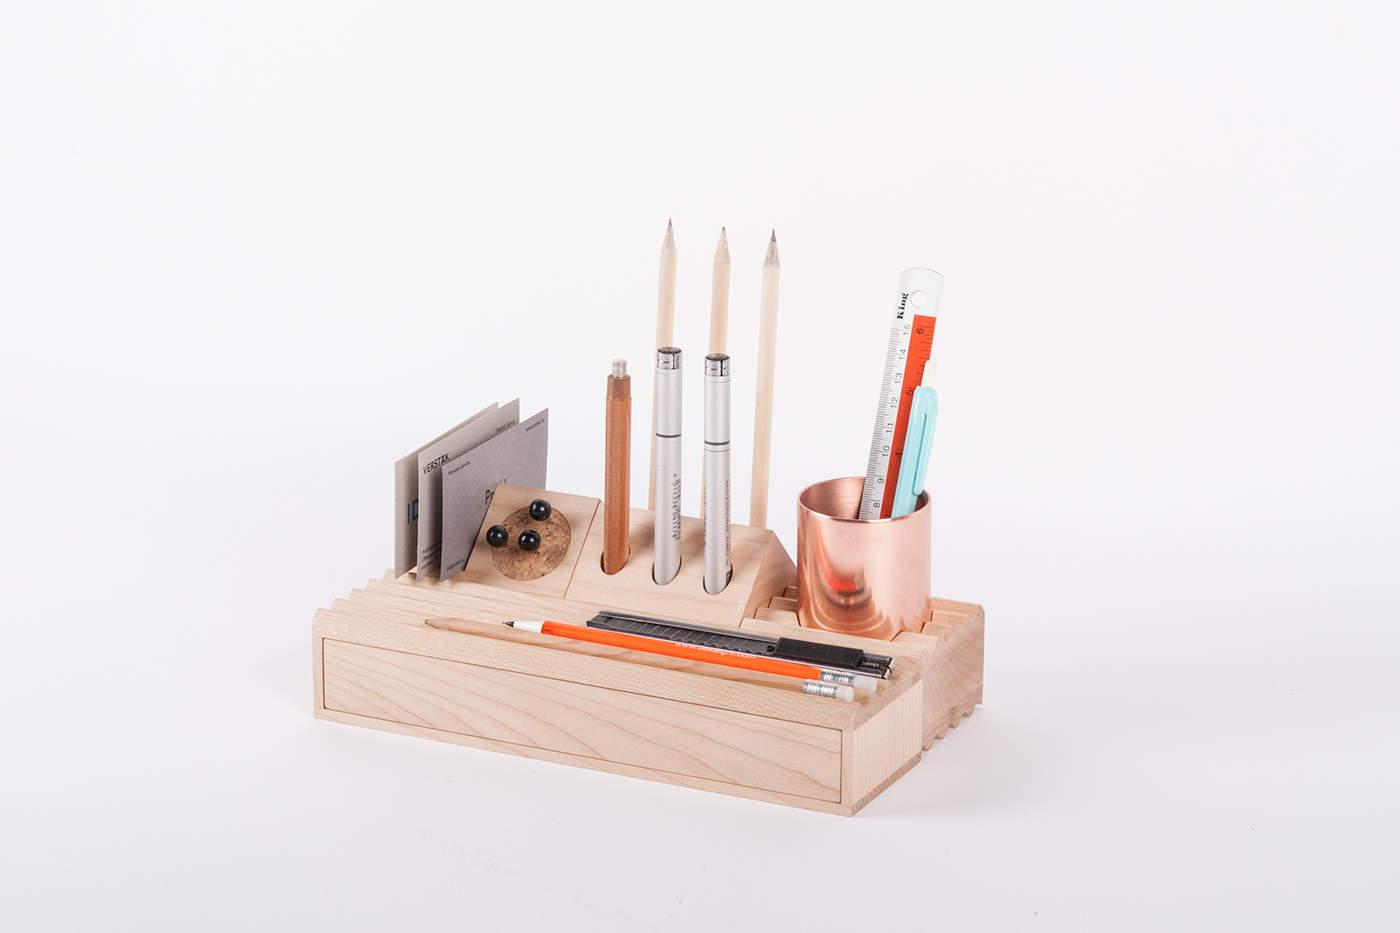 accessoires-de-bureau-design-maxim-scherbakov